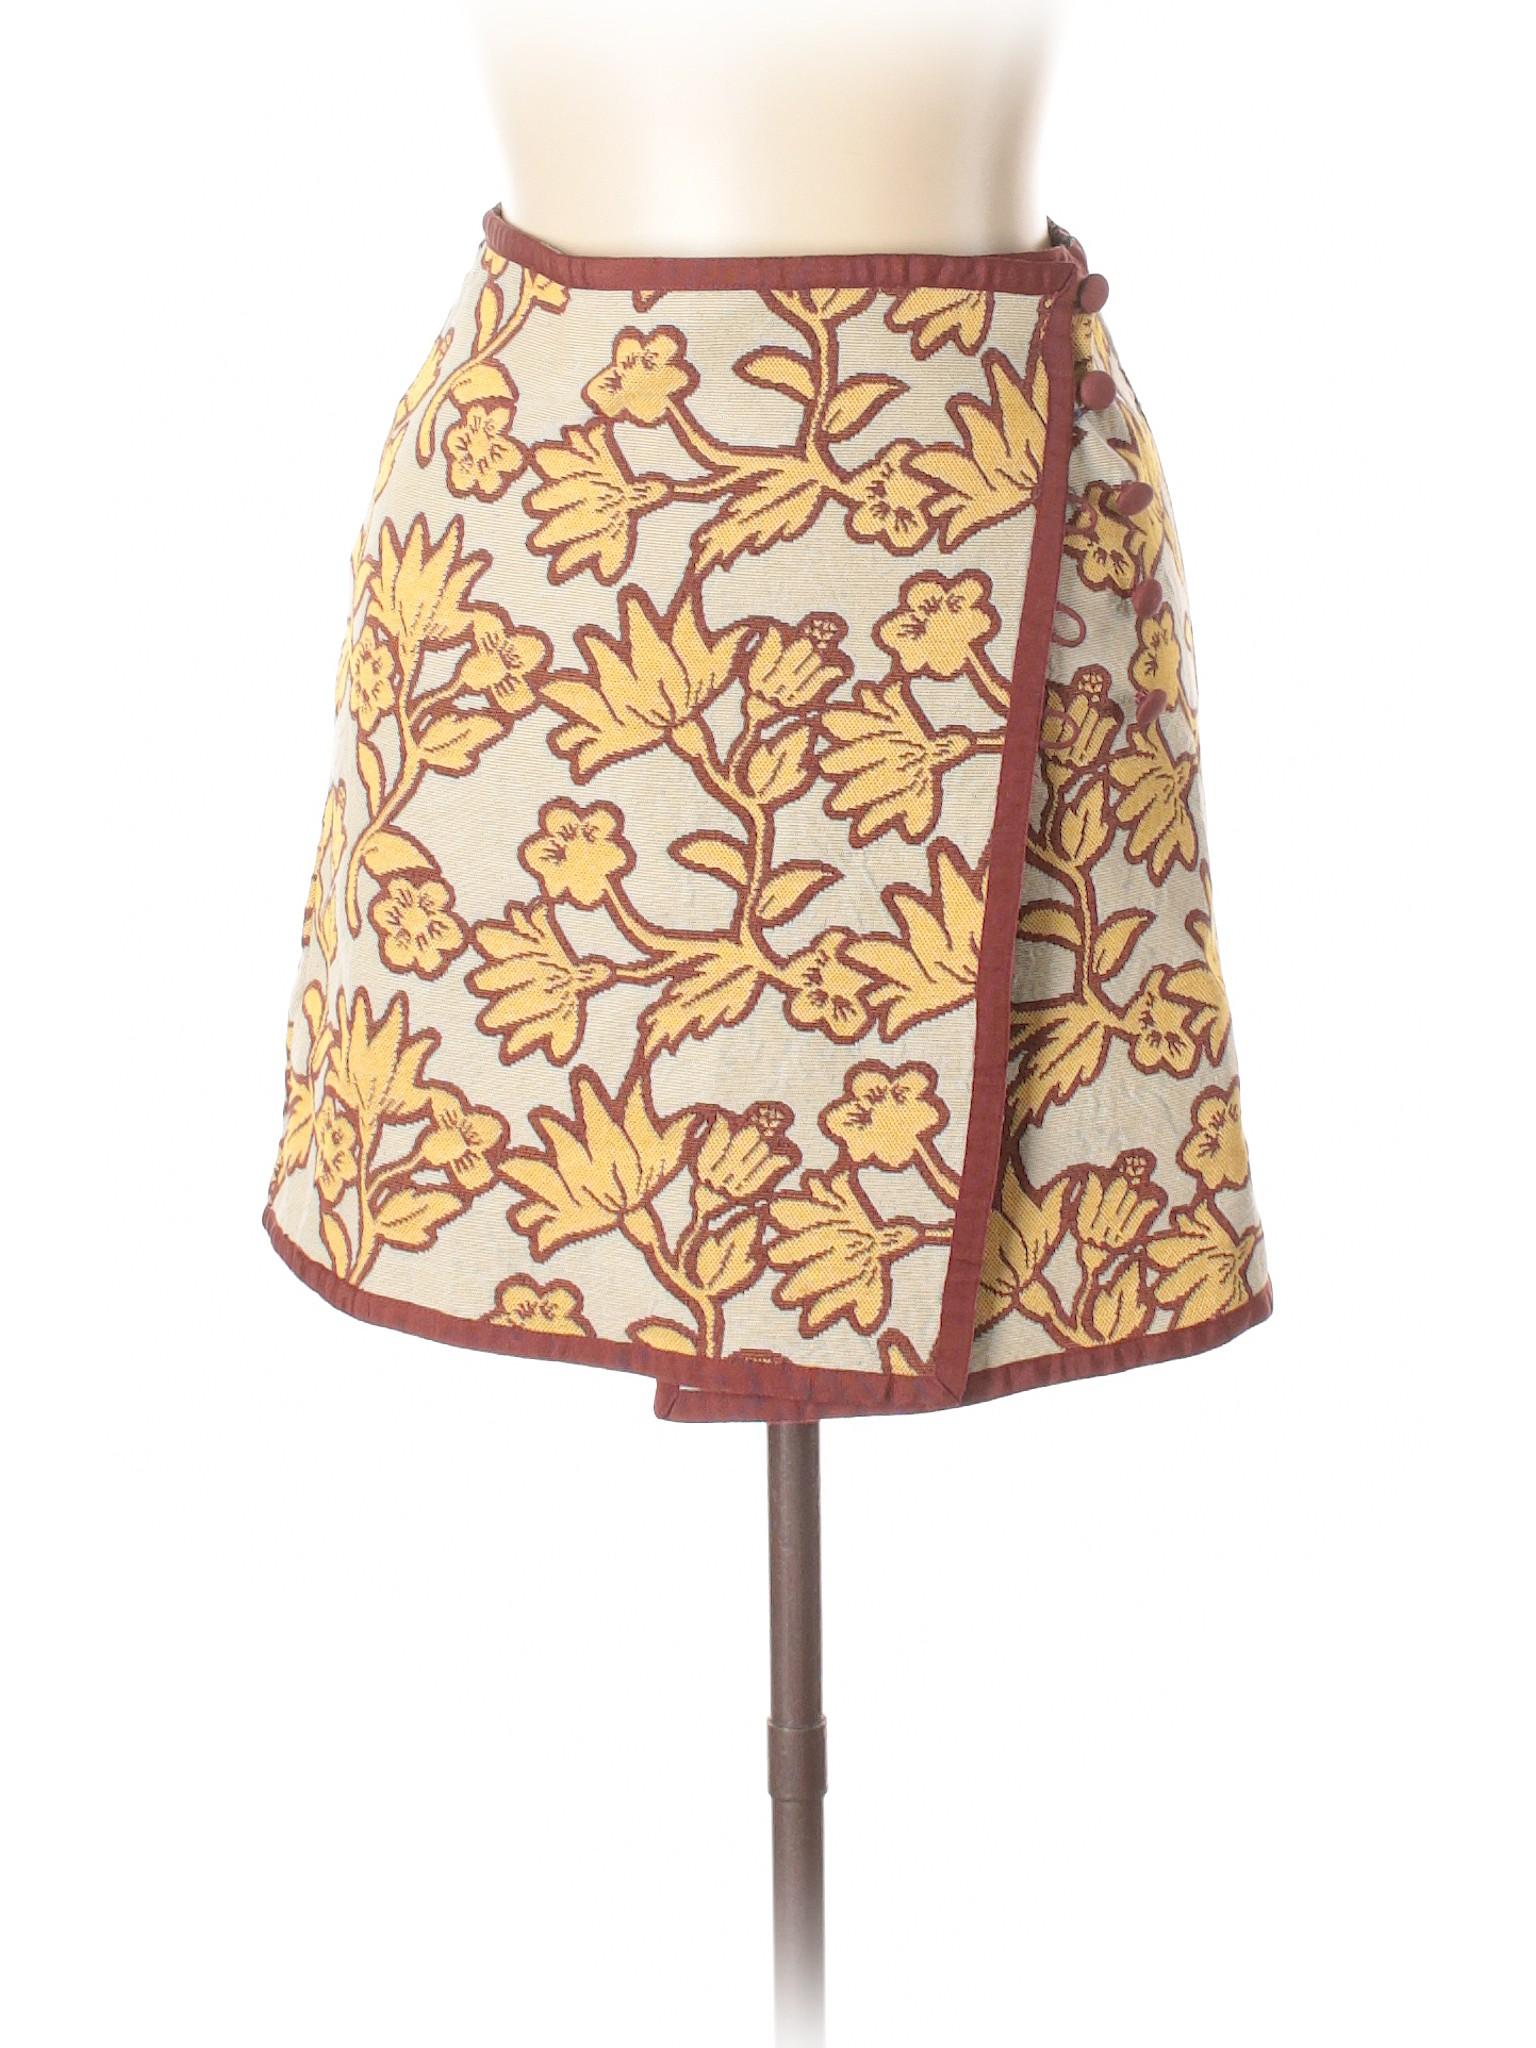 Casual Boutique Boutique Boutique Casual Casual Casual Boutique Skirt Skirt Boutique Skirt Skirt zRzXaq